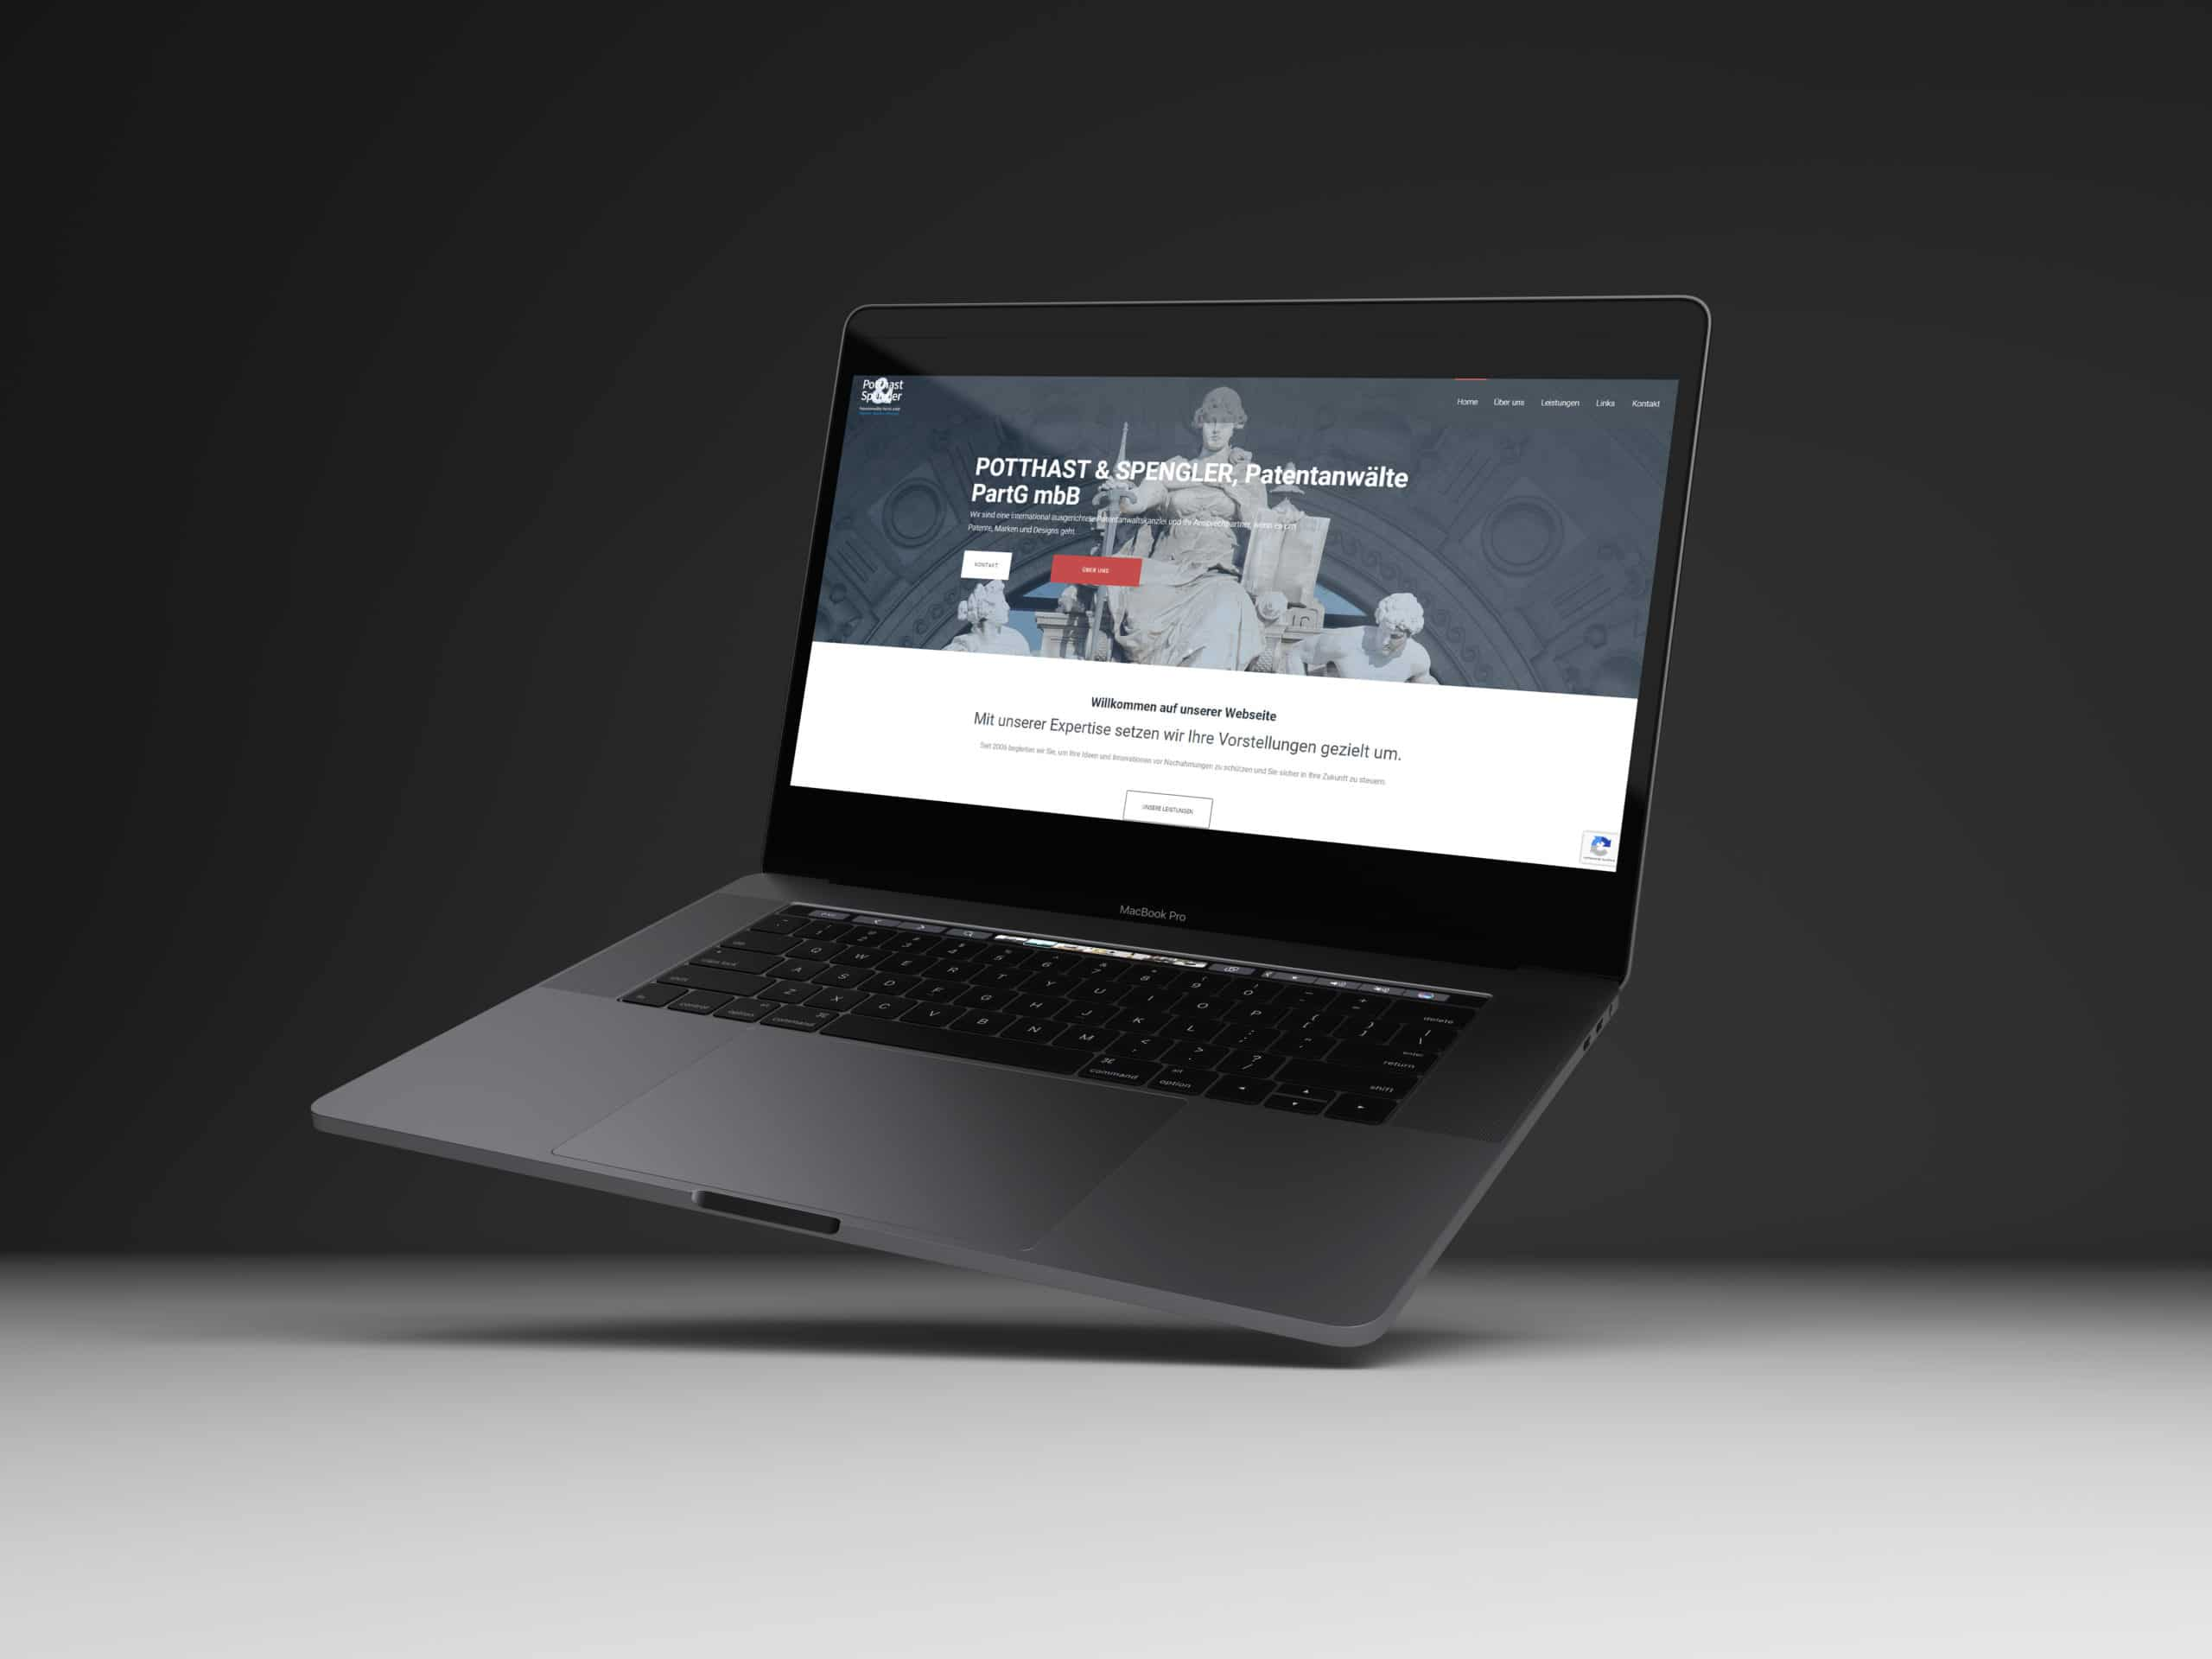 Rechtsanwaelte Webdesign Potthast und Spengler